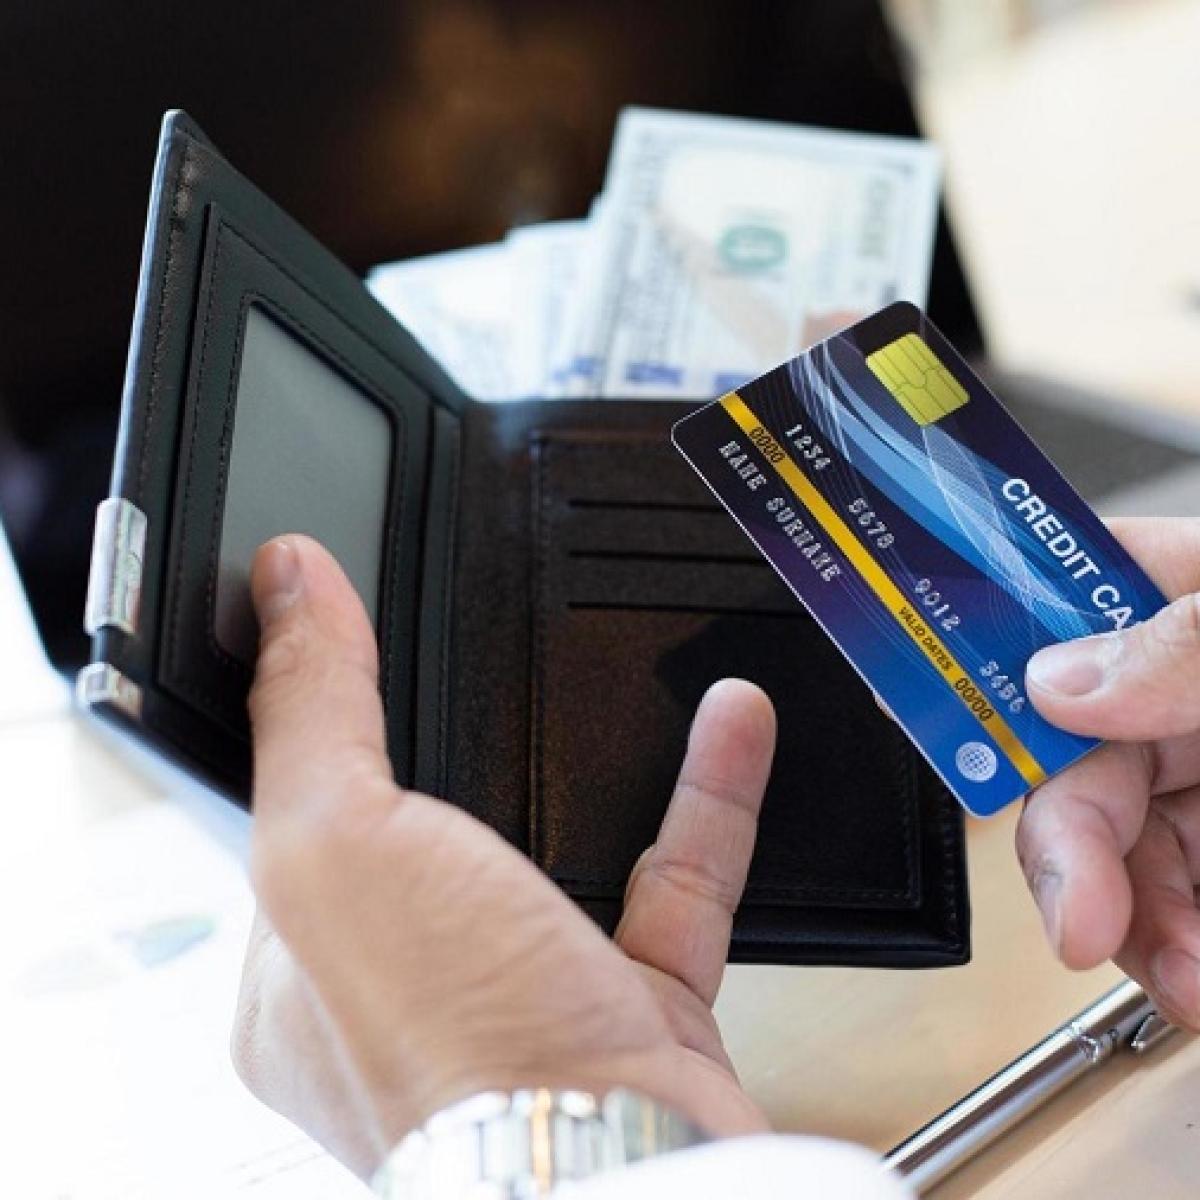 Ten crore Indians' card data selling on Dark Web: Researcher